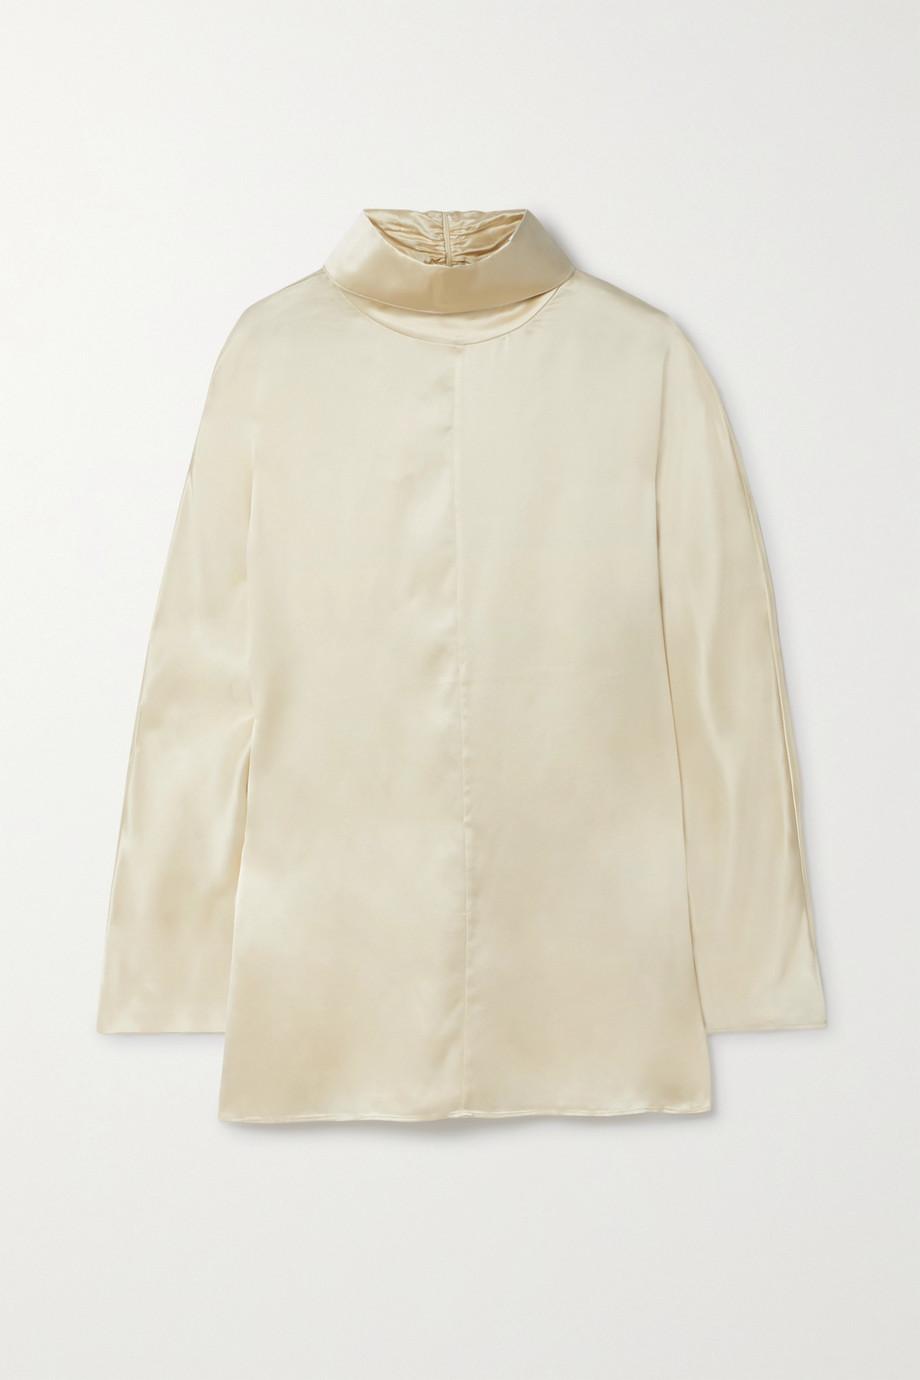 Co Silk-satin turtleneck blouse